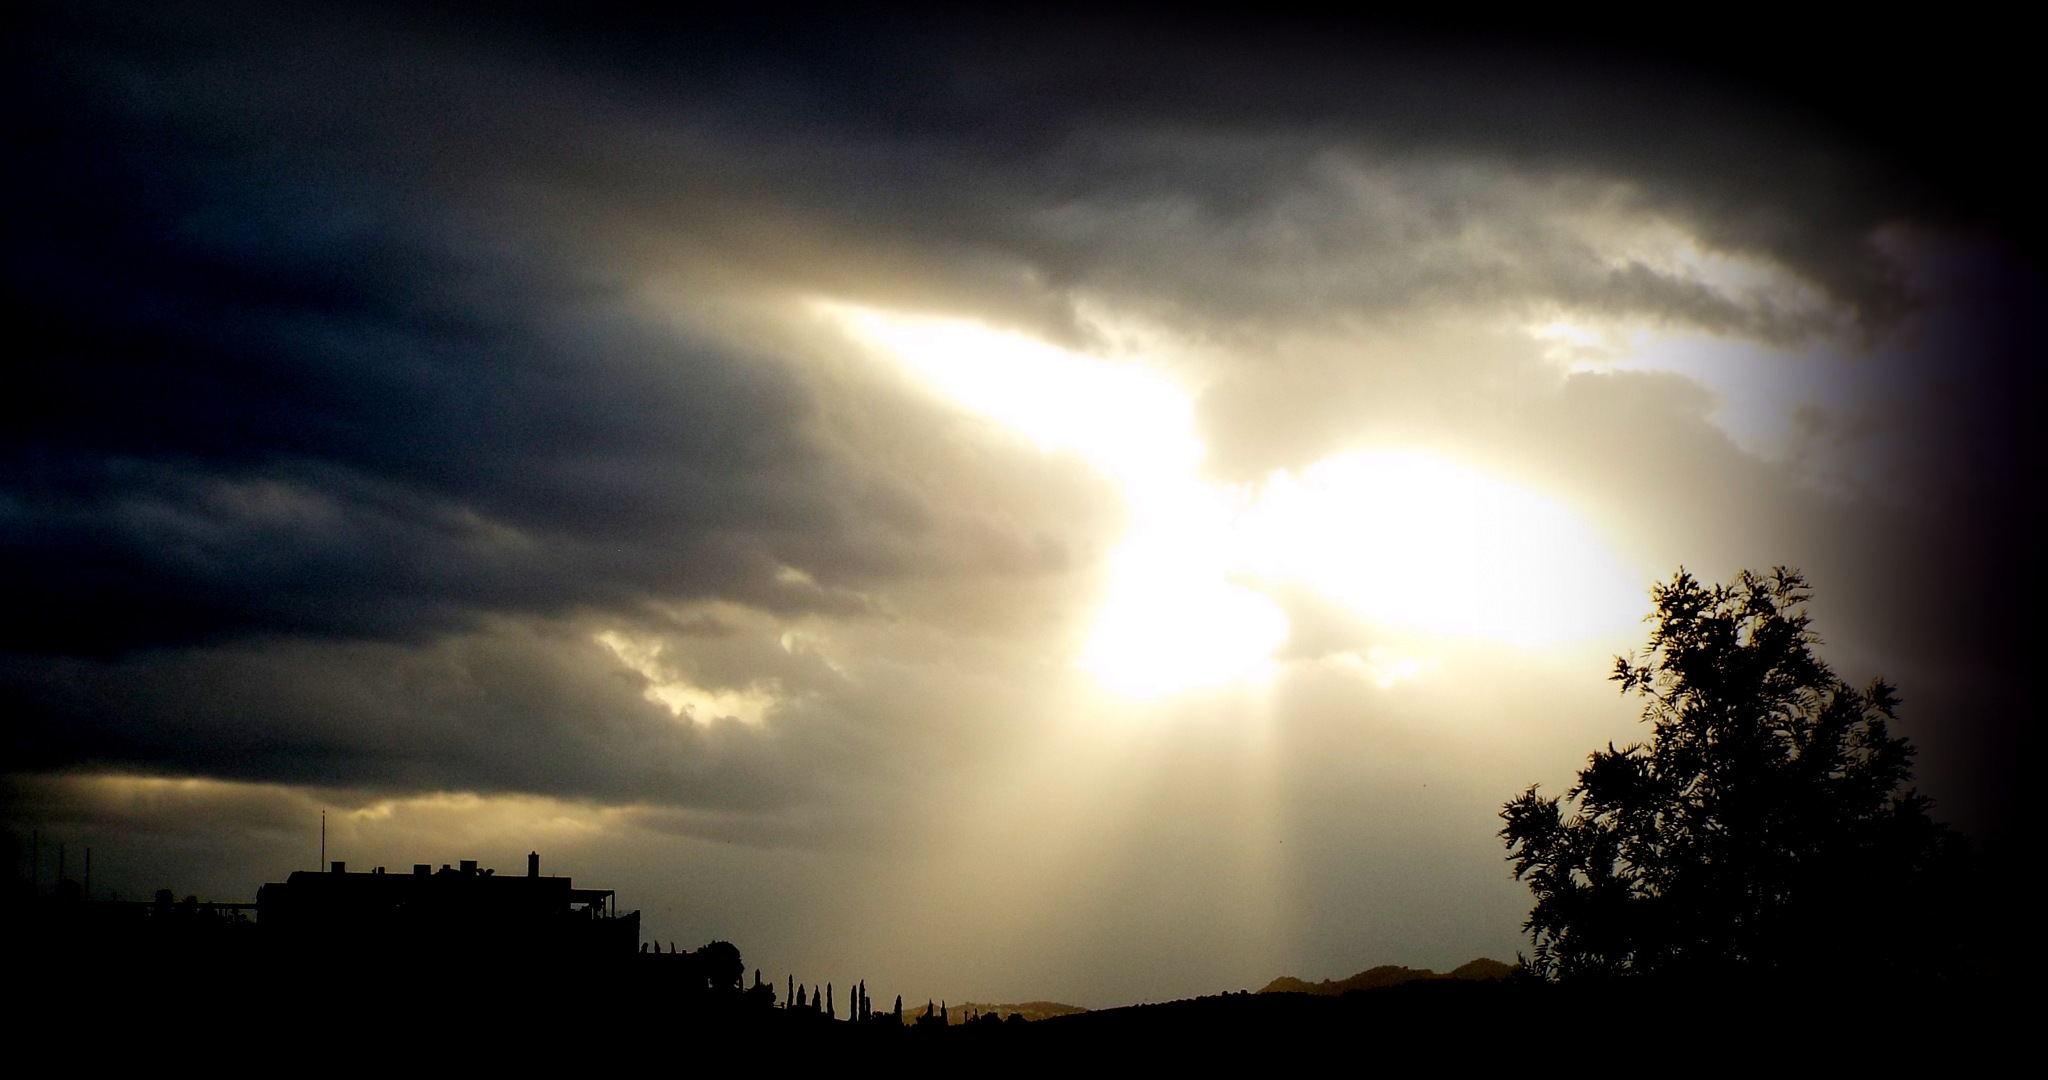 UNTITLED SUNSET, BITEZ by Akin Saner